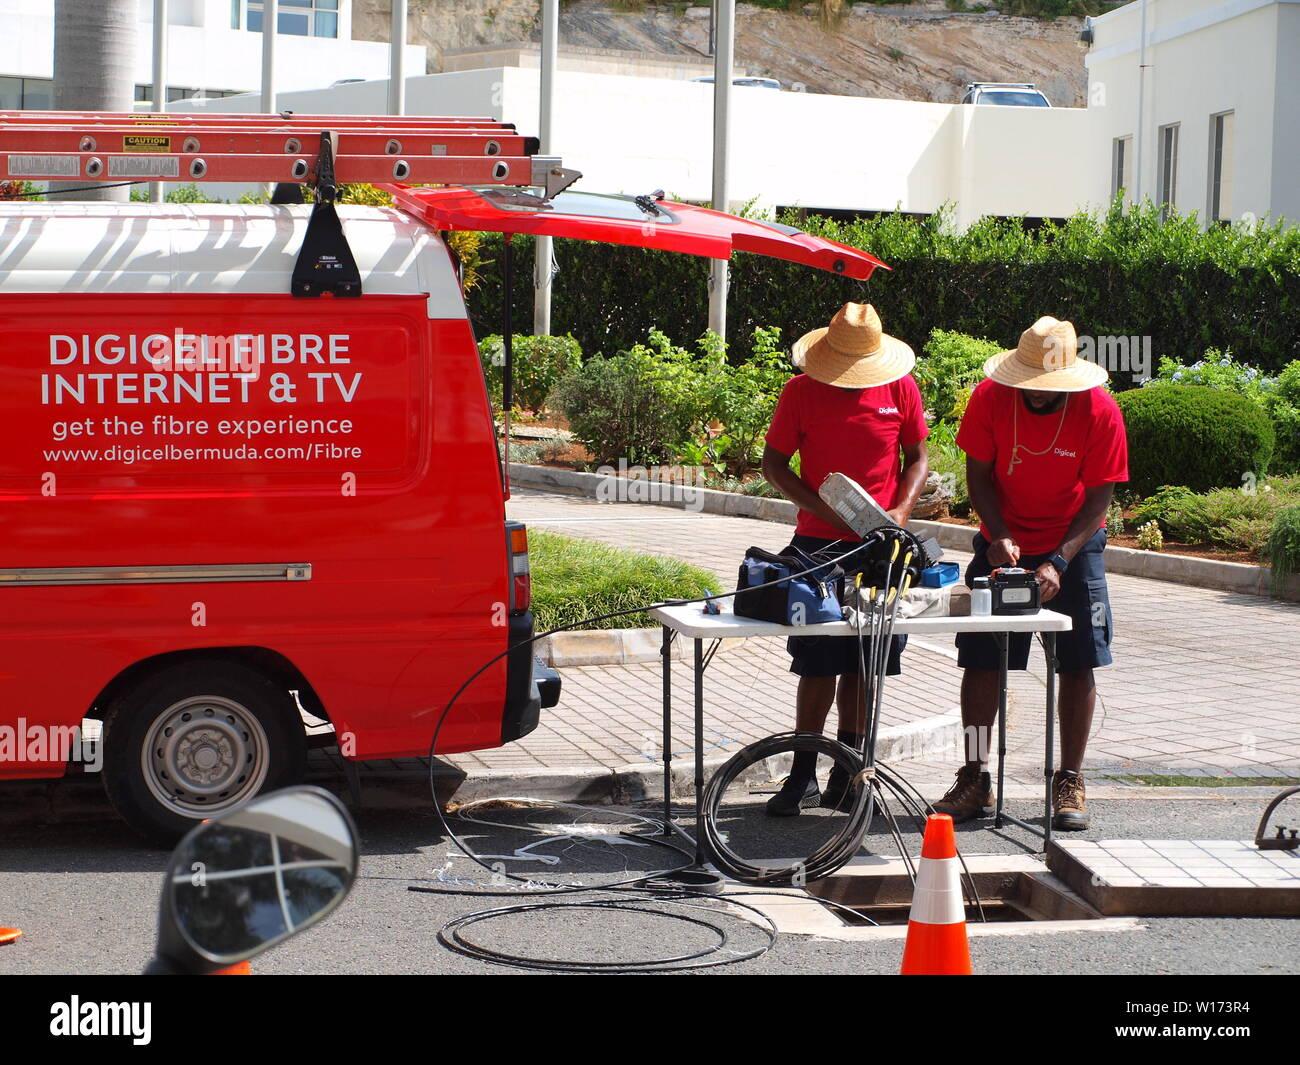 Local Bermuda utility workers in straw hats repairing fiber optic cable in Hamilton, Bermuda. Stock Photo